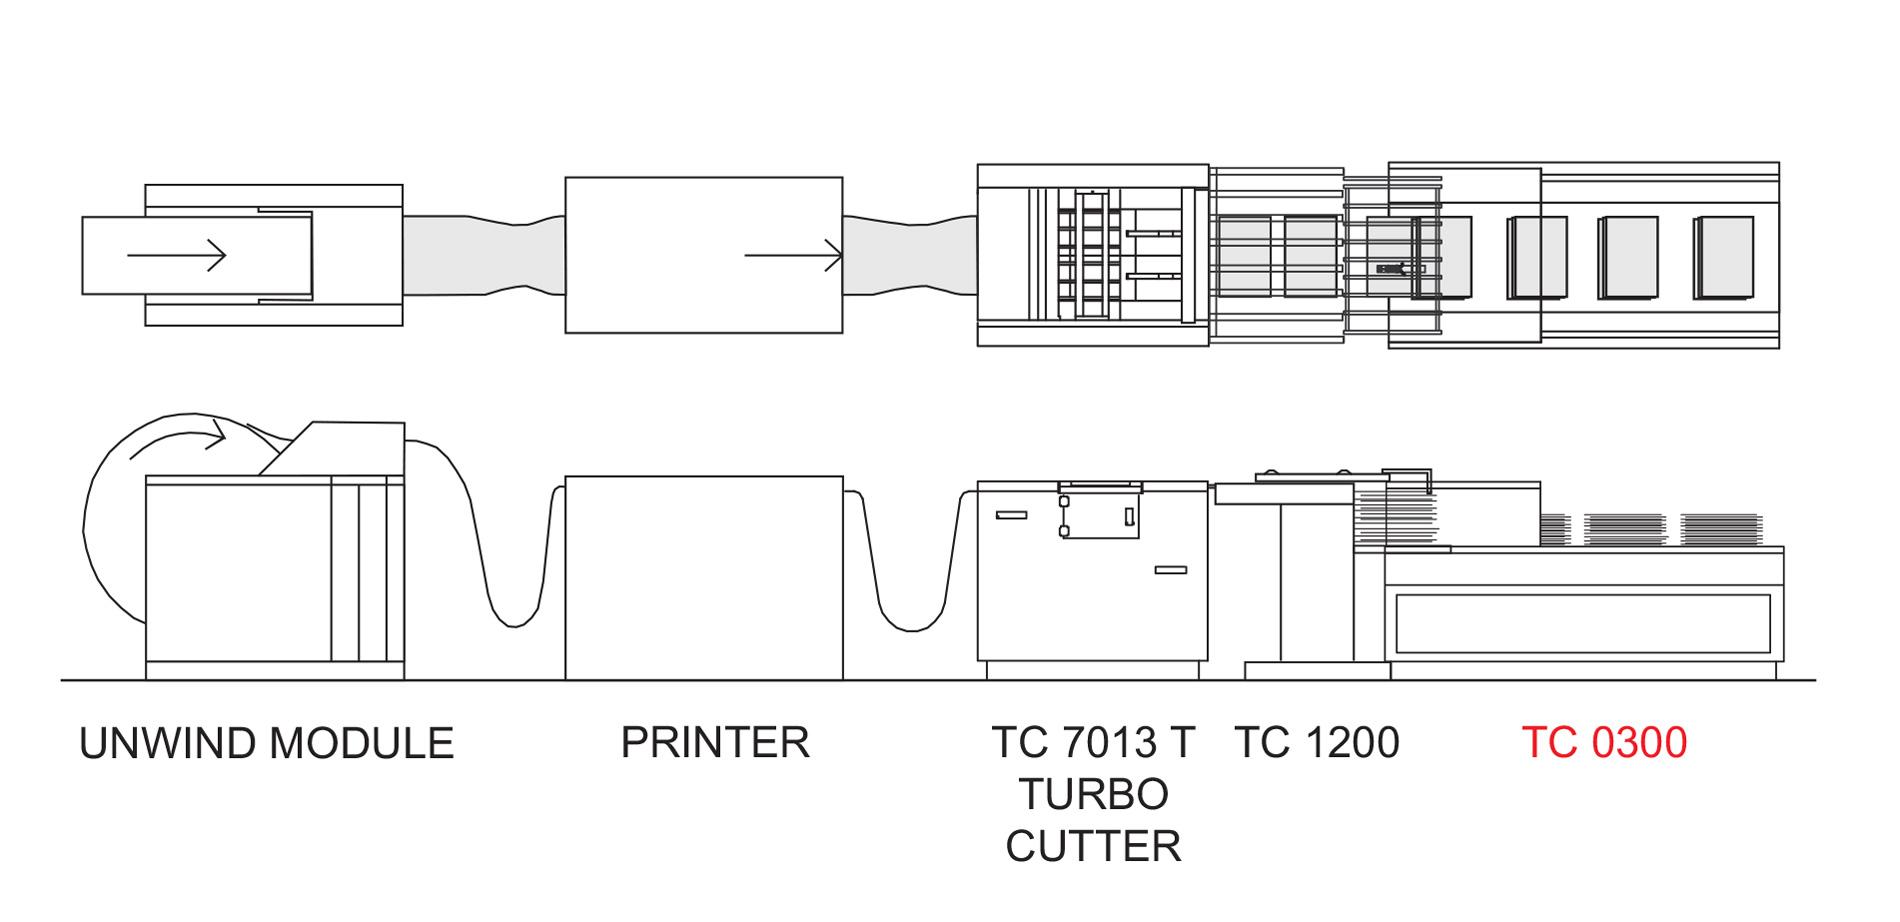 TC_0300_Schema002.jpg